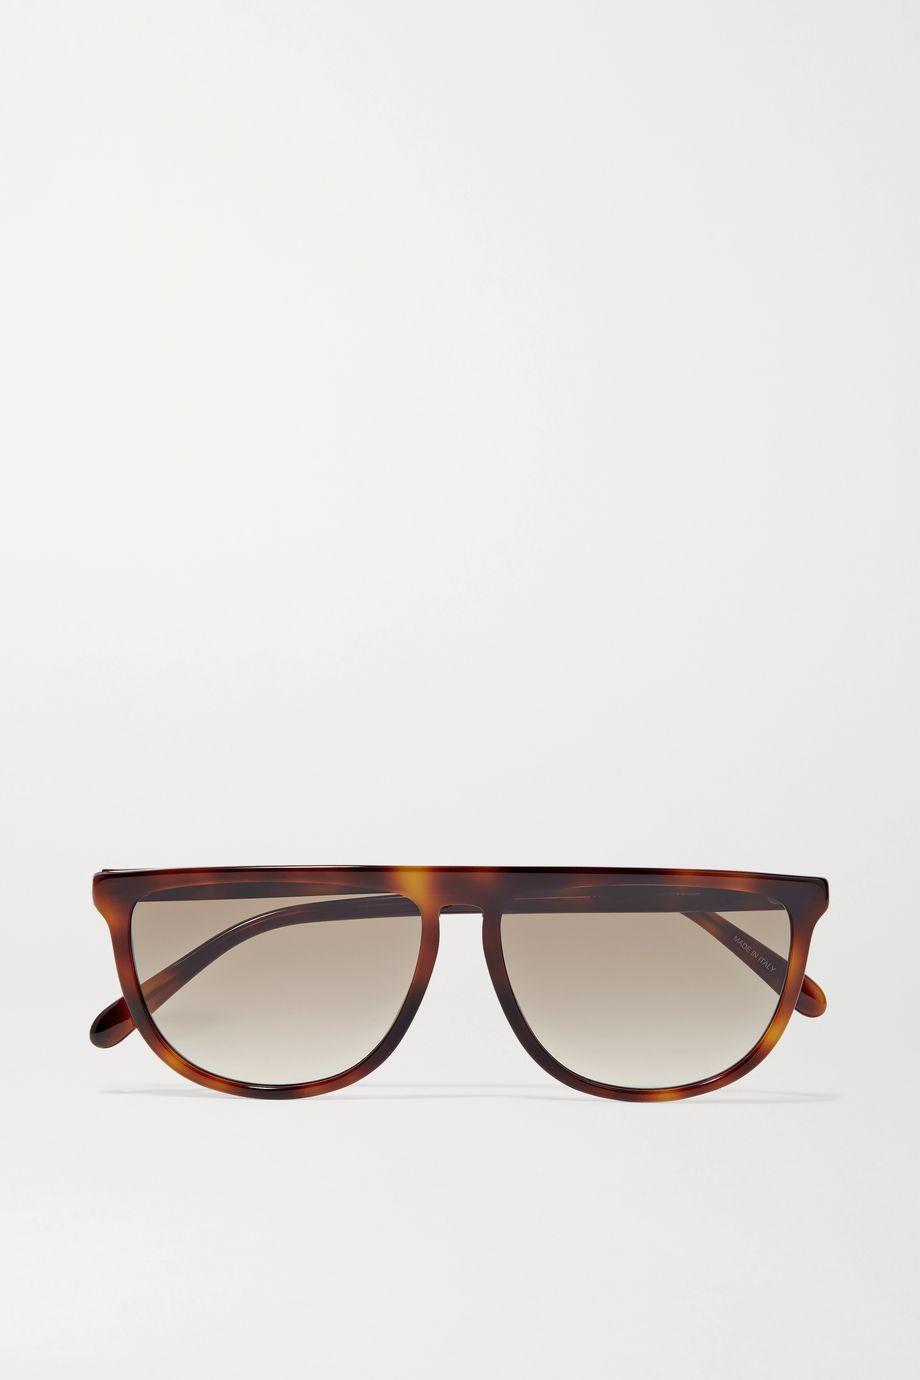 Givenchy D-frame tortoiseshell acetate sunglasses